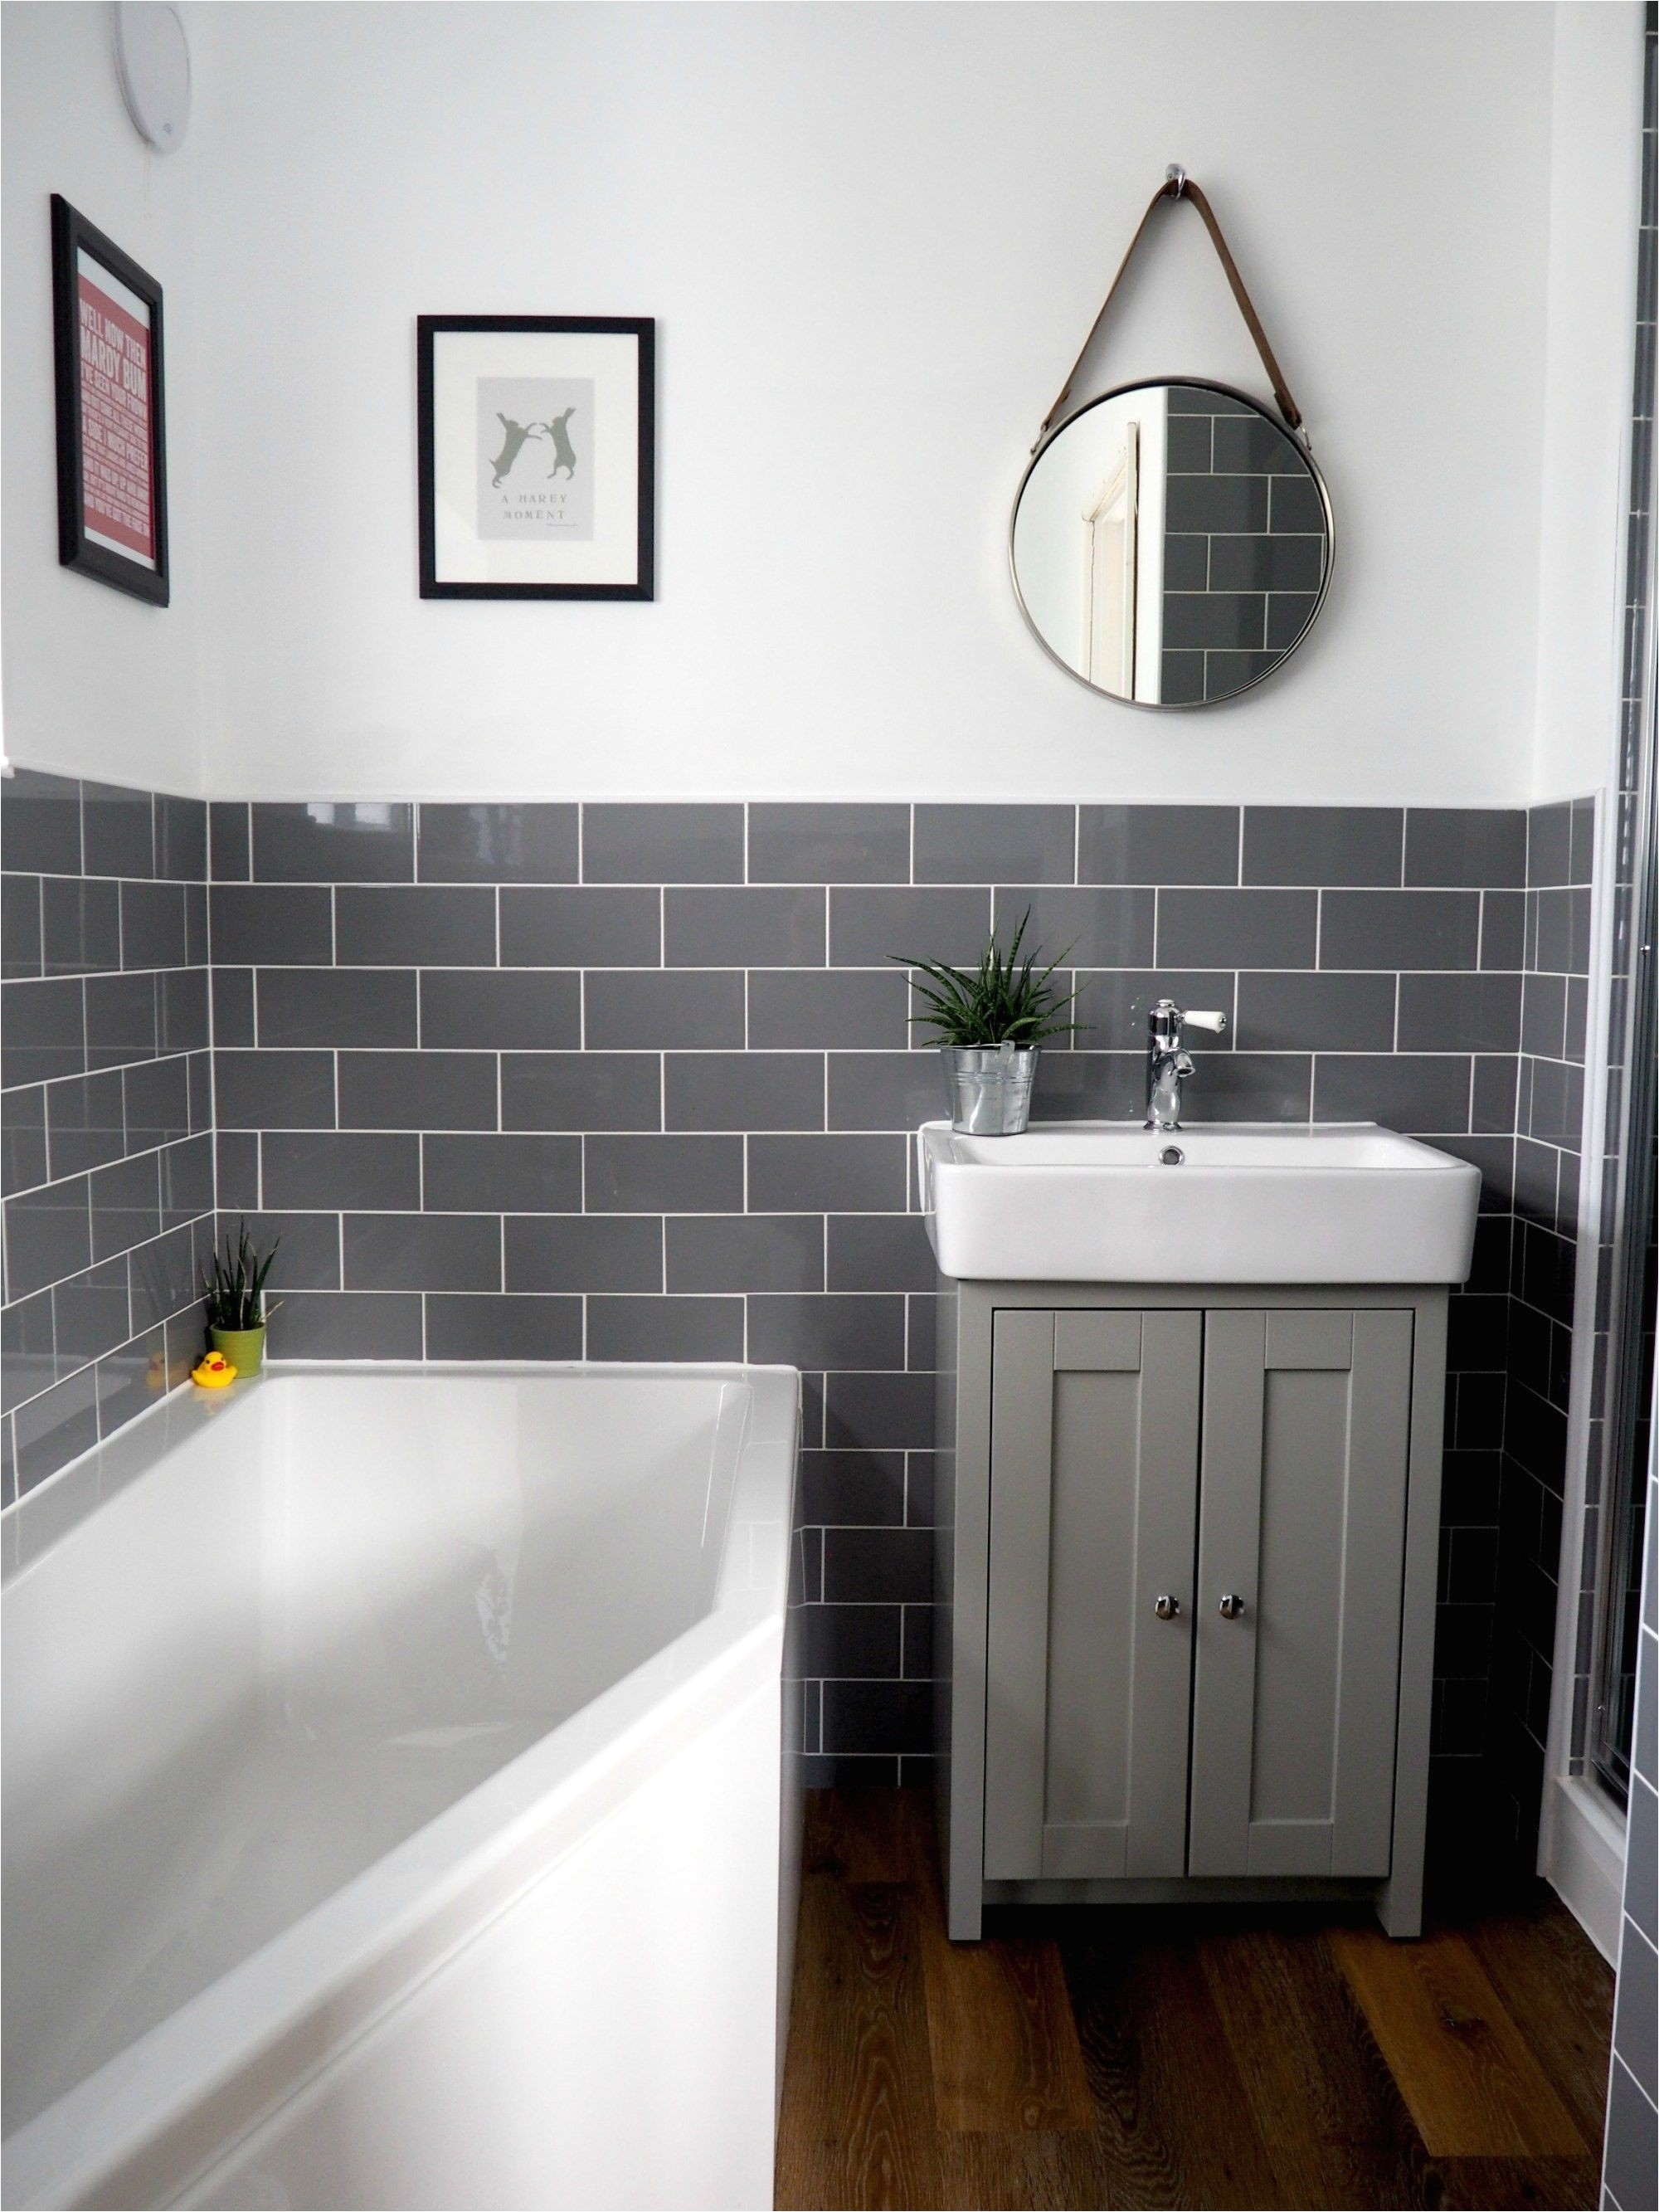 Design Ideas for Small Bathroom On A Budget Awe Inspiring Small Bathroom Updates A Bud